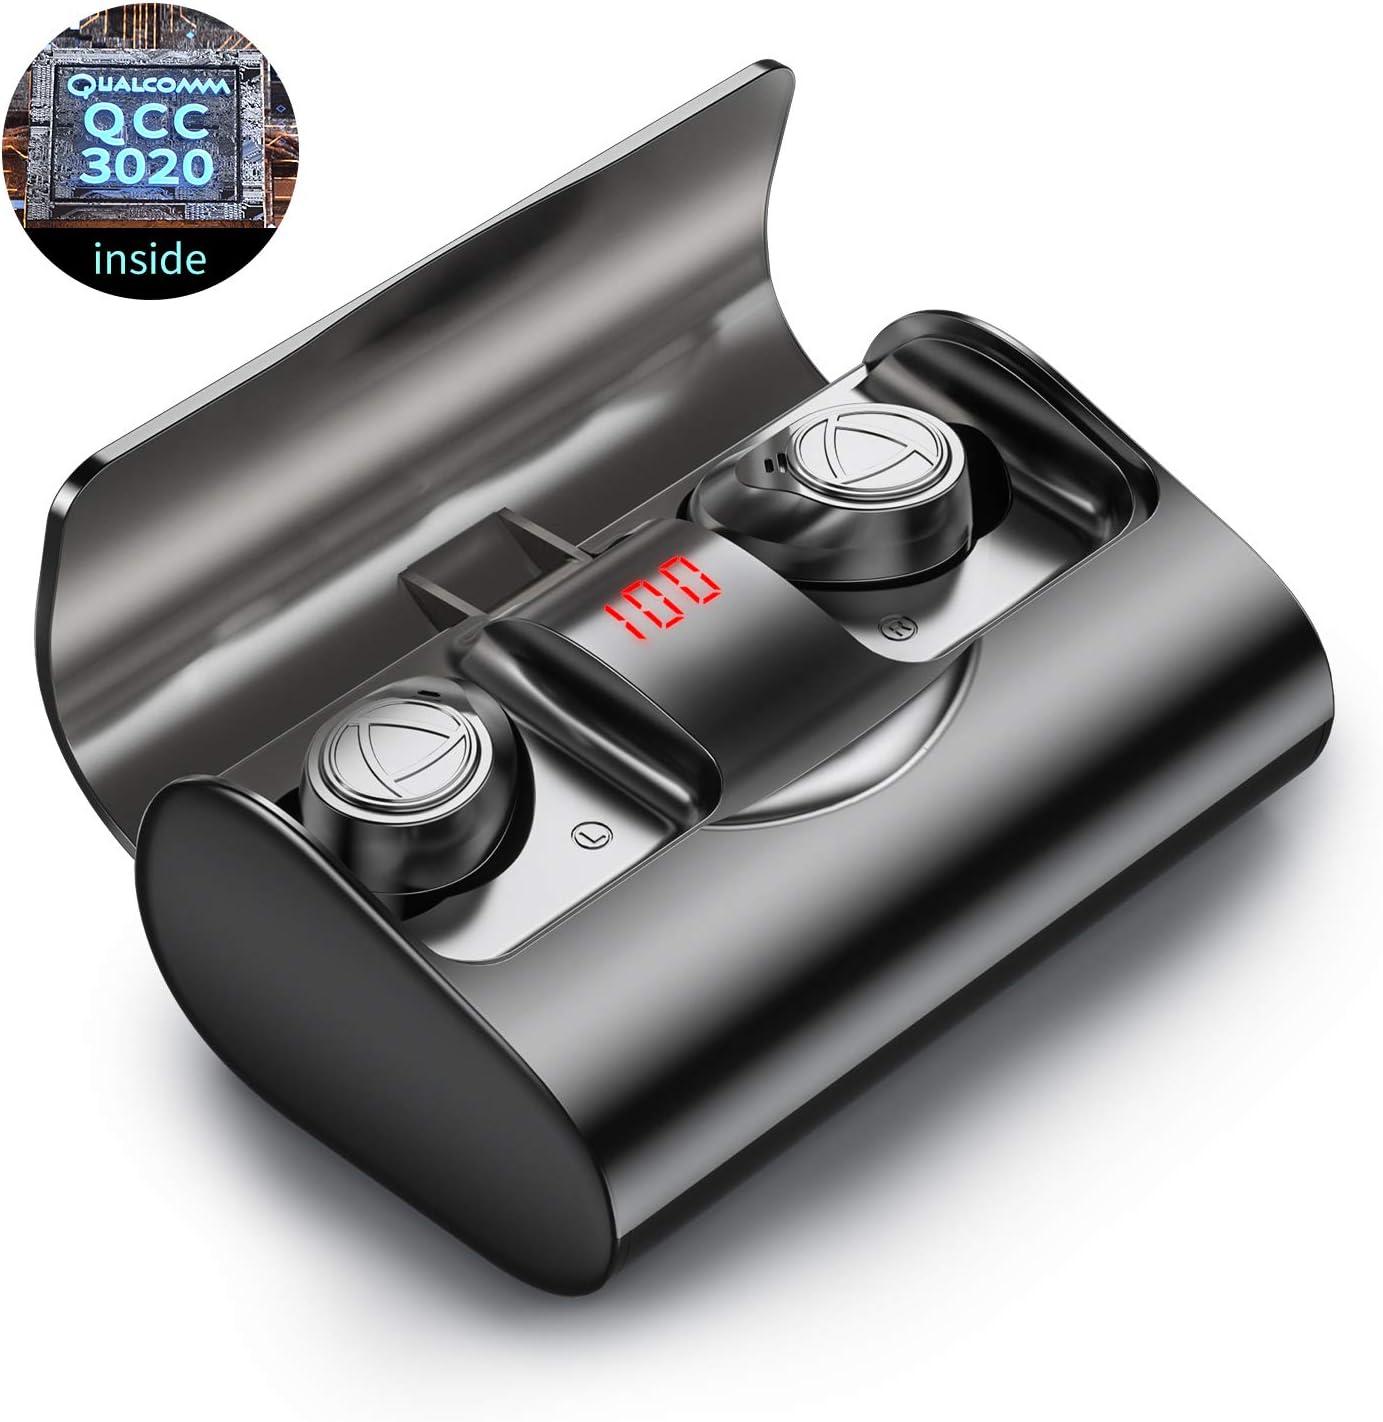 Auriculares inalámbricos Bluetooth 5.1 IHOUMI, para Hacer Deporte, Auriculares estéreo 6D de Alta fidelidad, IPX7 Impermeable,con Caja de Carga y micrófono, Control táctil